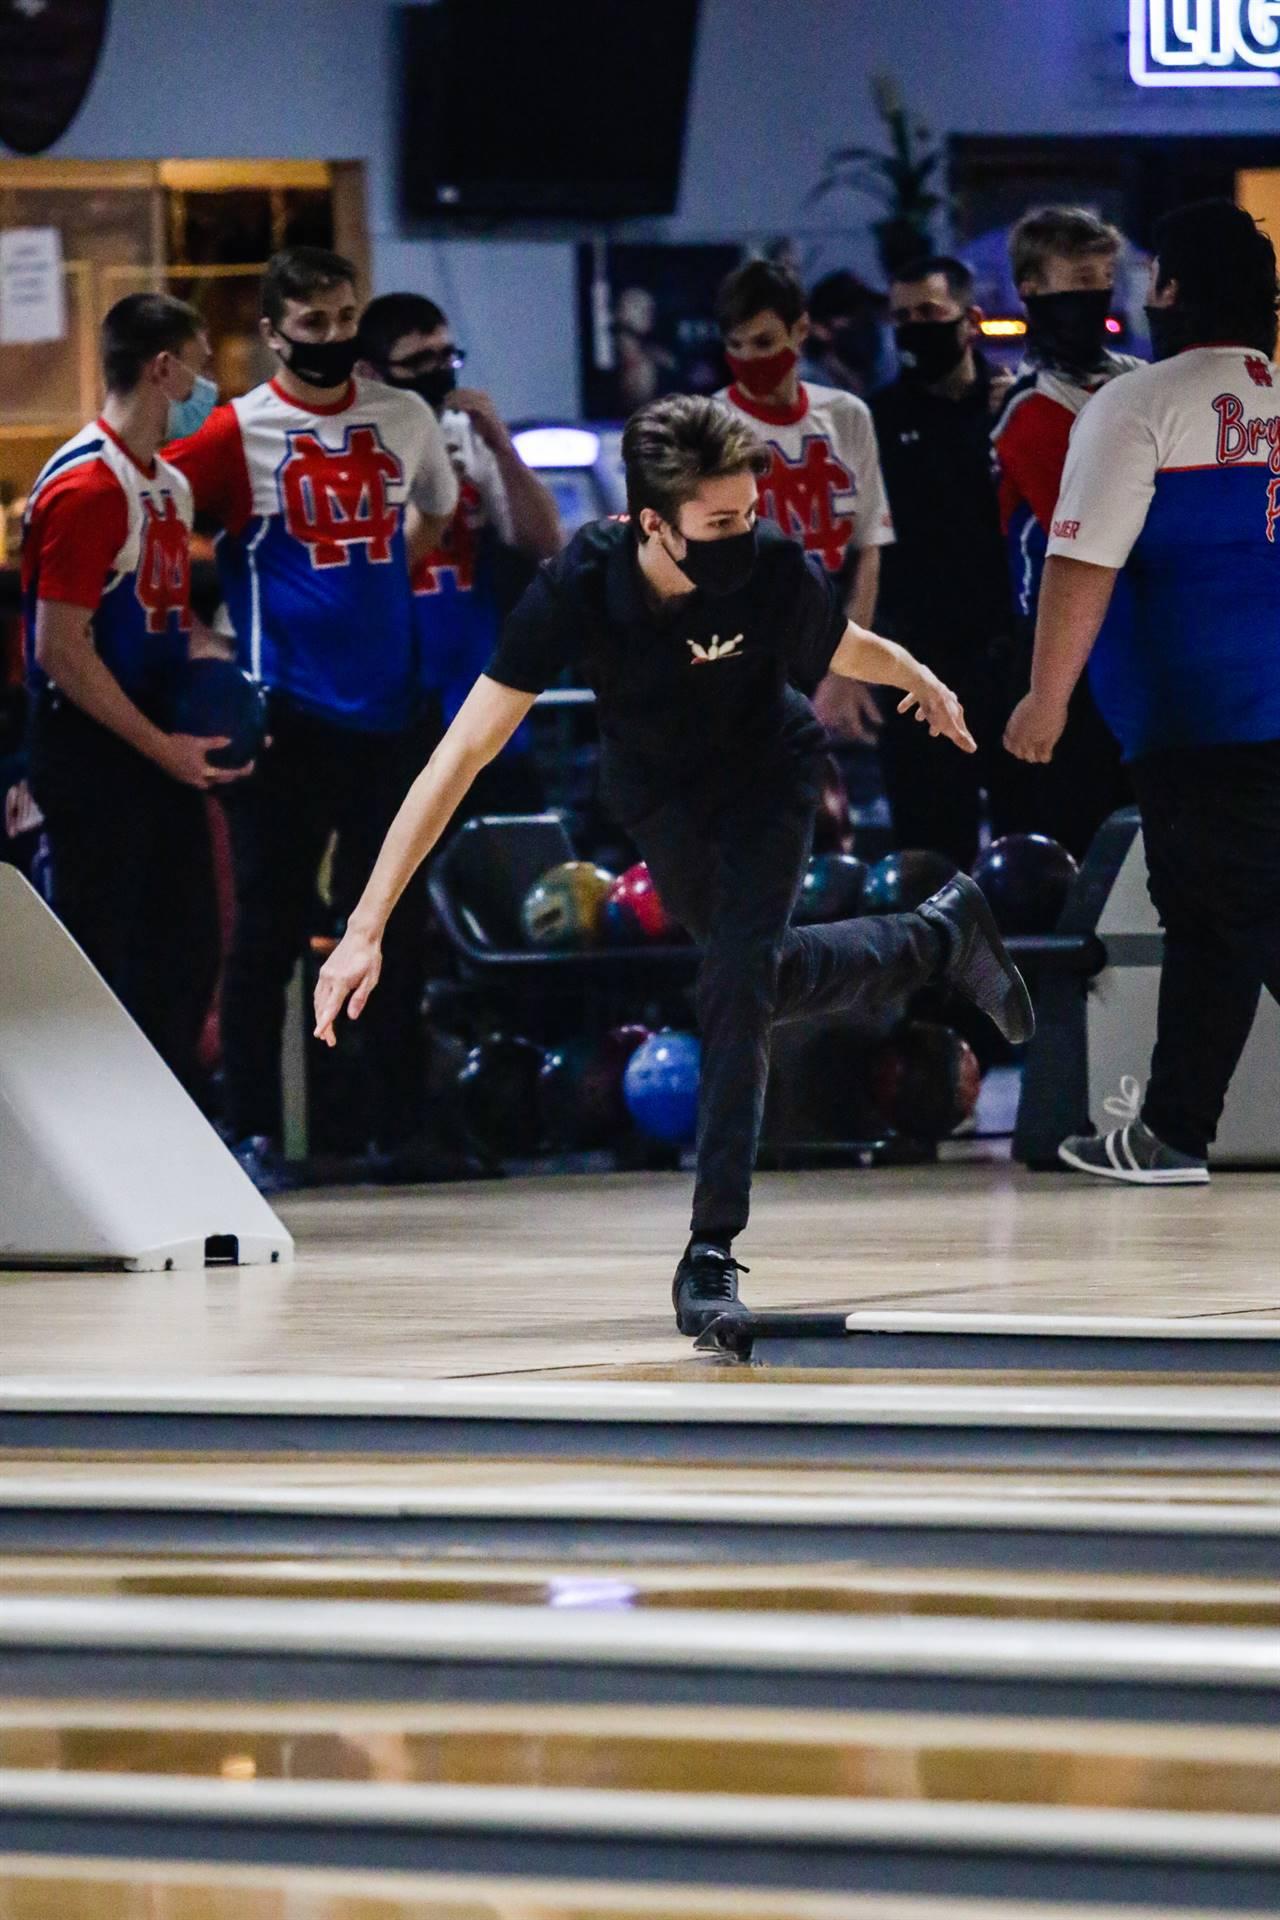 bowler releasing ball